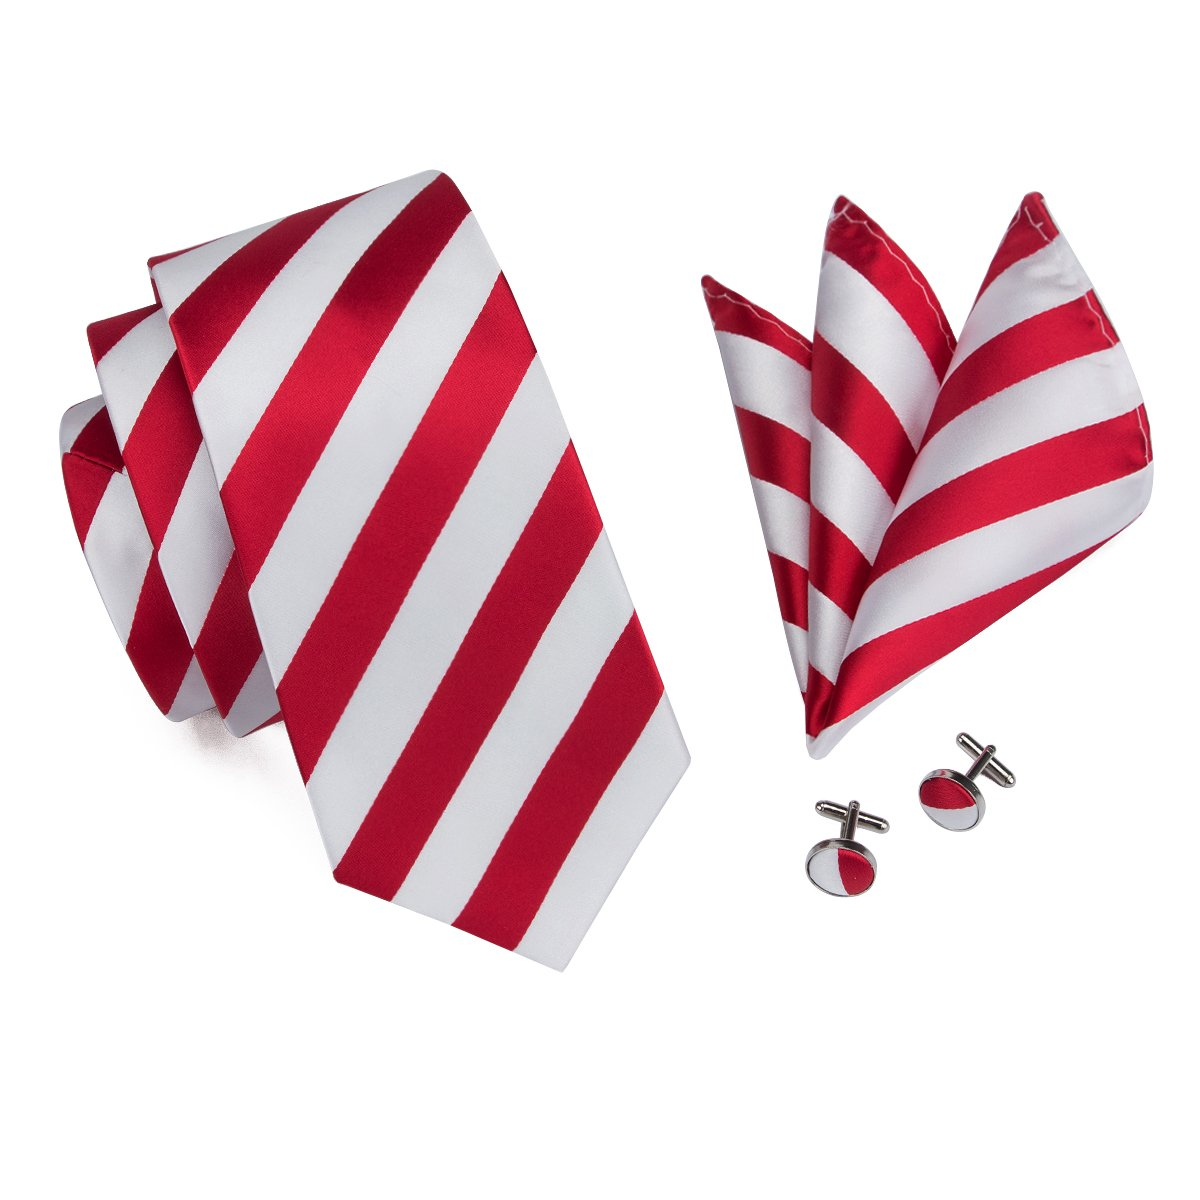 Hi-Tie Men Stripes Tie Handkerchief Necktie with Cufflinks and Pocket Square Tie Set GCUS-0394